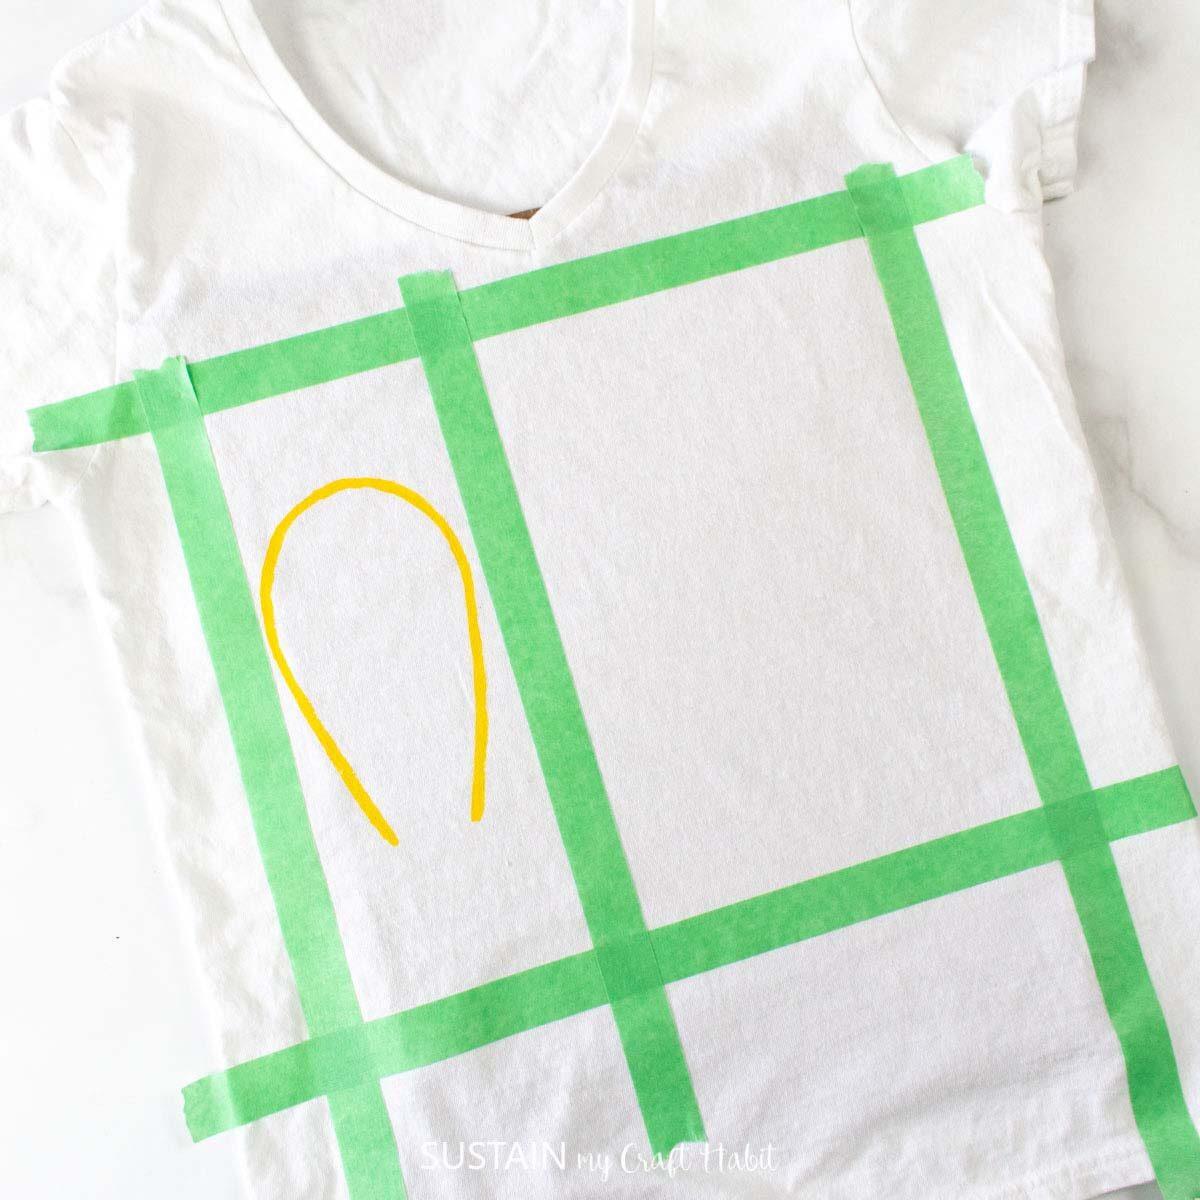 Painting a light bulb shape on the tshirt.